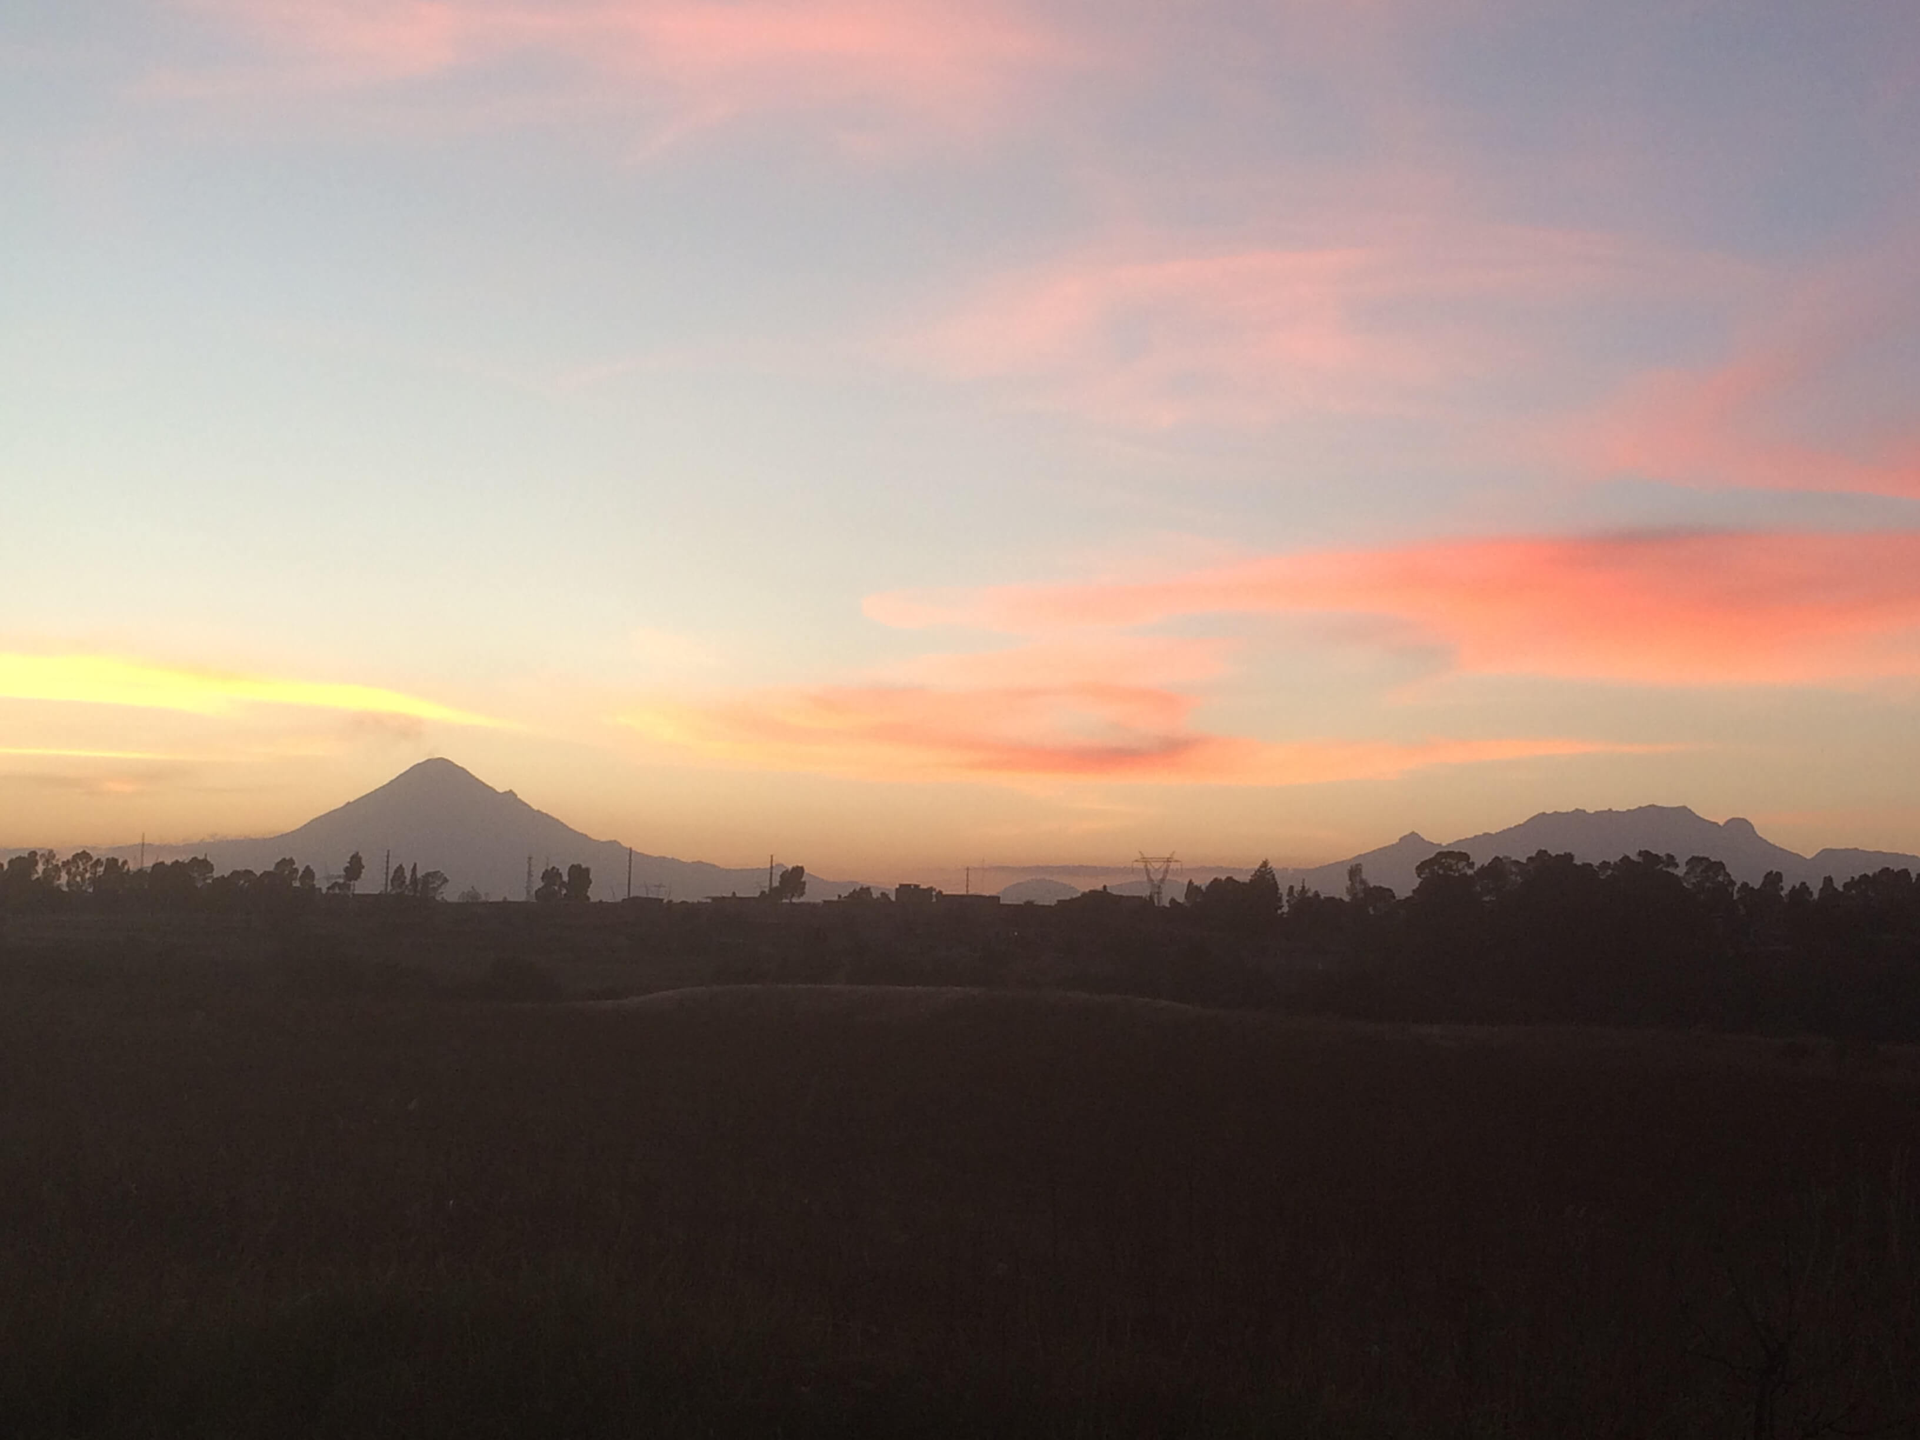 Der Vulkan Popocatepétl ist wieder aktiv